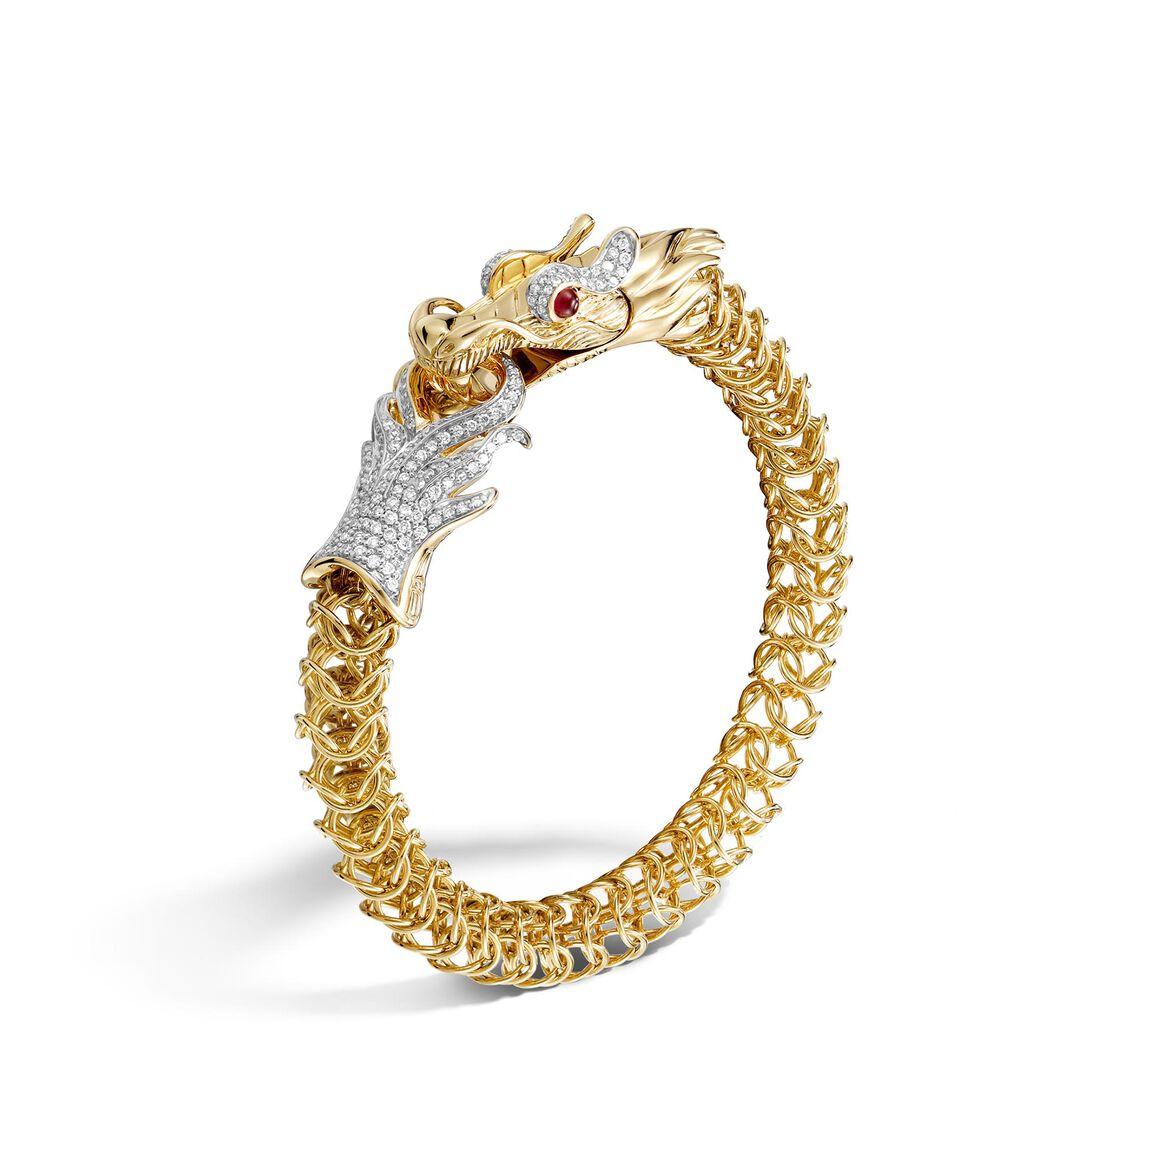 Legends 9MM Link Bracelet in 18K Gold with Diamonds